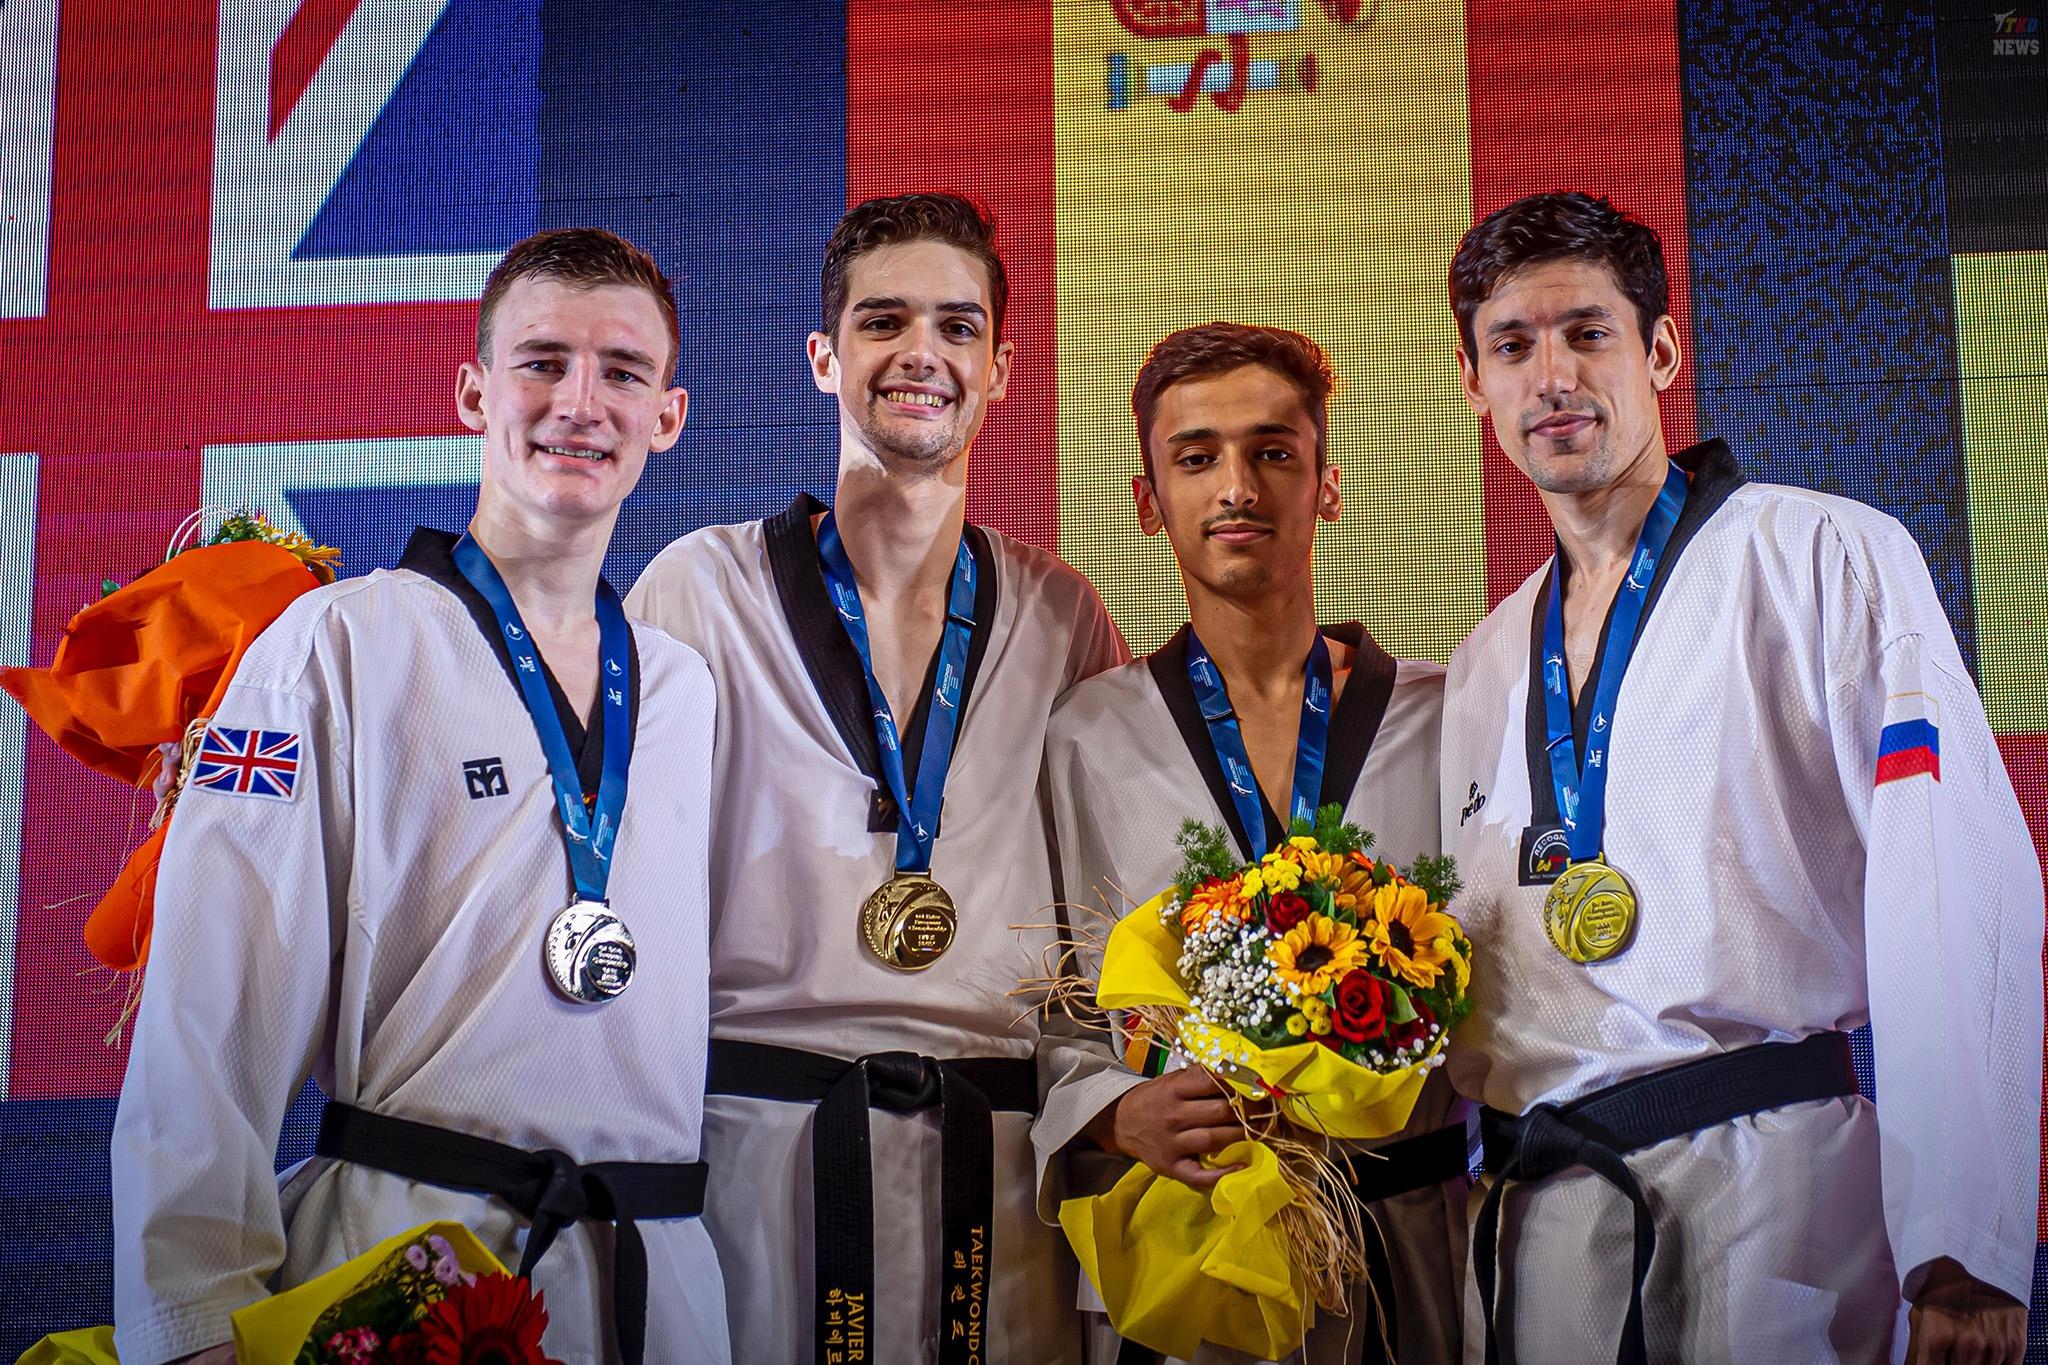 1572793028_male-68a_g4-extra-european-taekwondo-championships-bari-2019